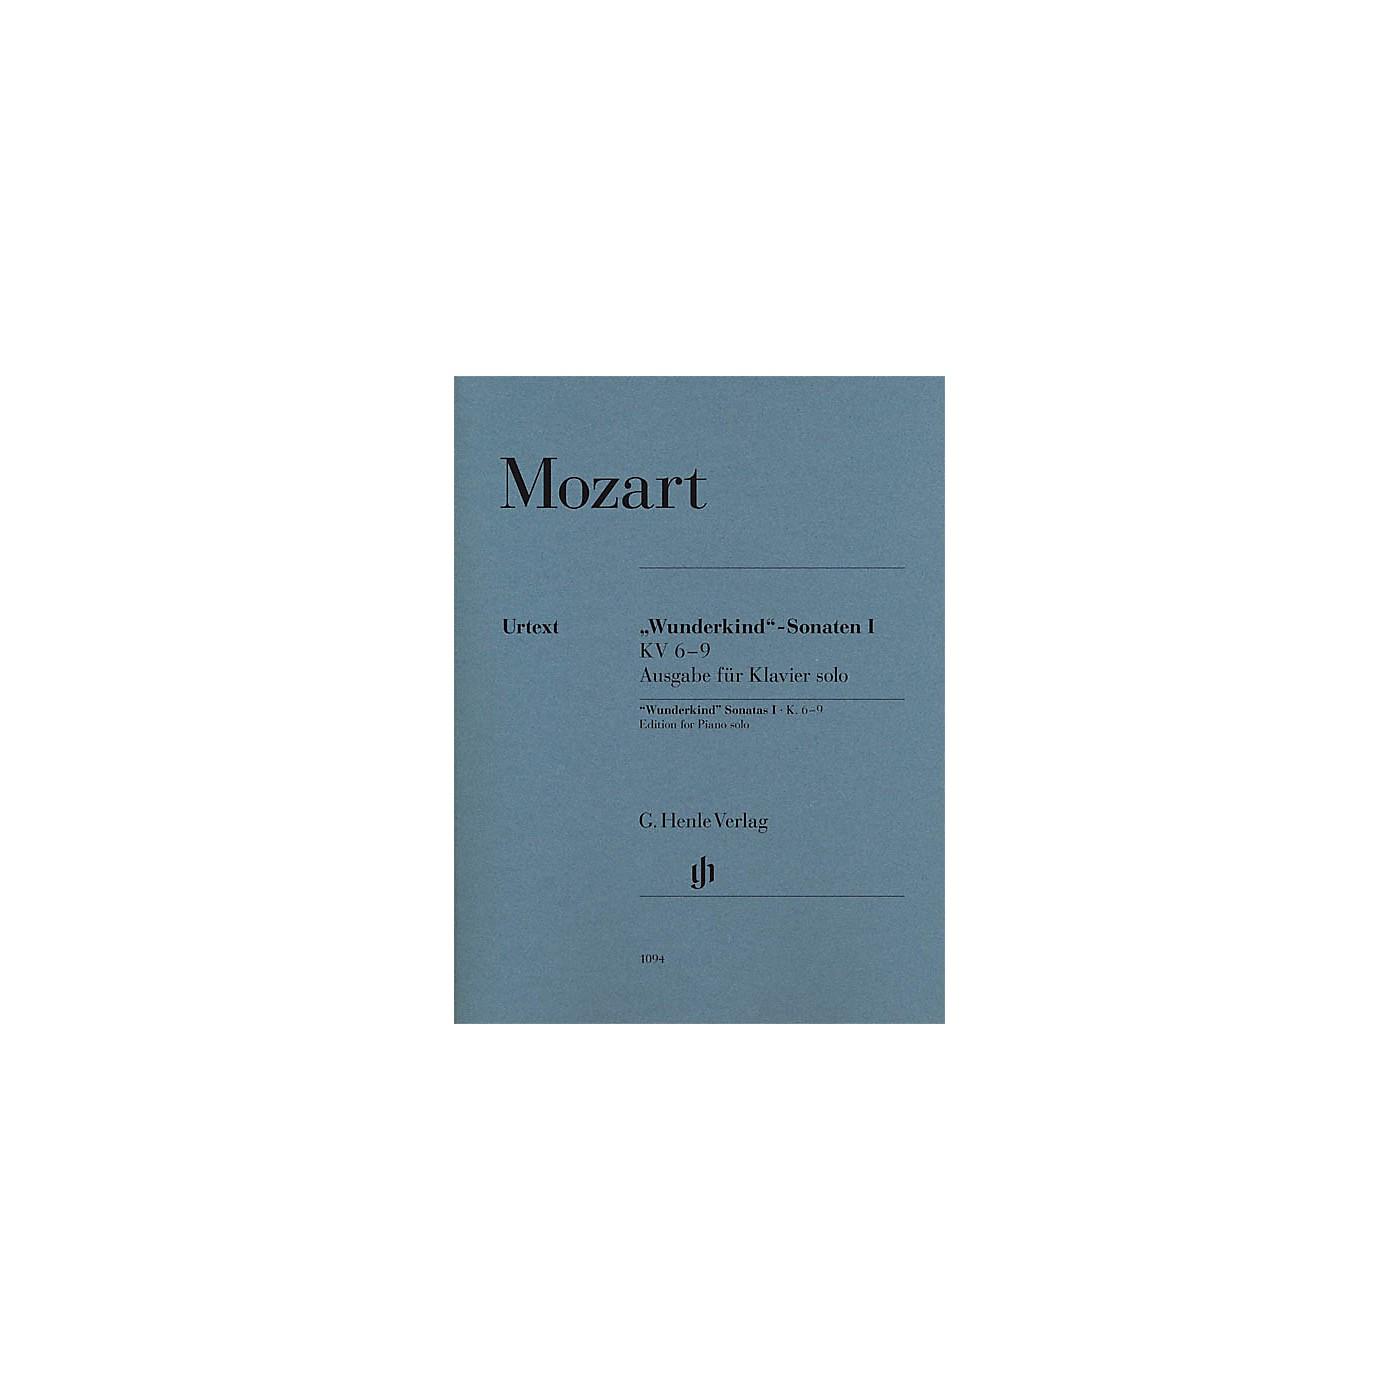 G. Henle Verlag Wunderkind Sonatas, Vol 2, K. 10-15 Henle Music Softcover by Mozart Edited by Wolf-Dieter Seiffert thumbnail